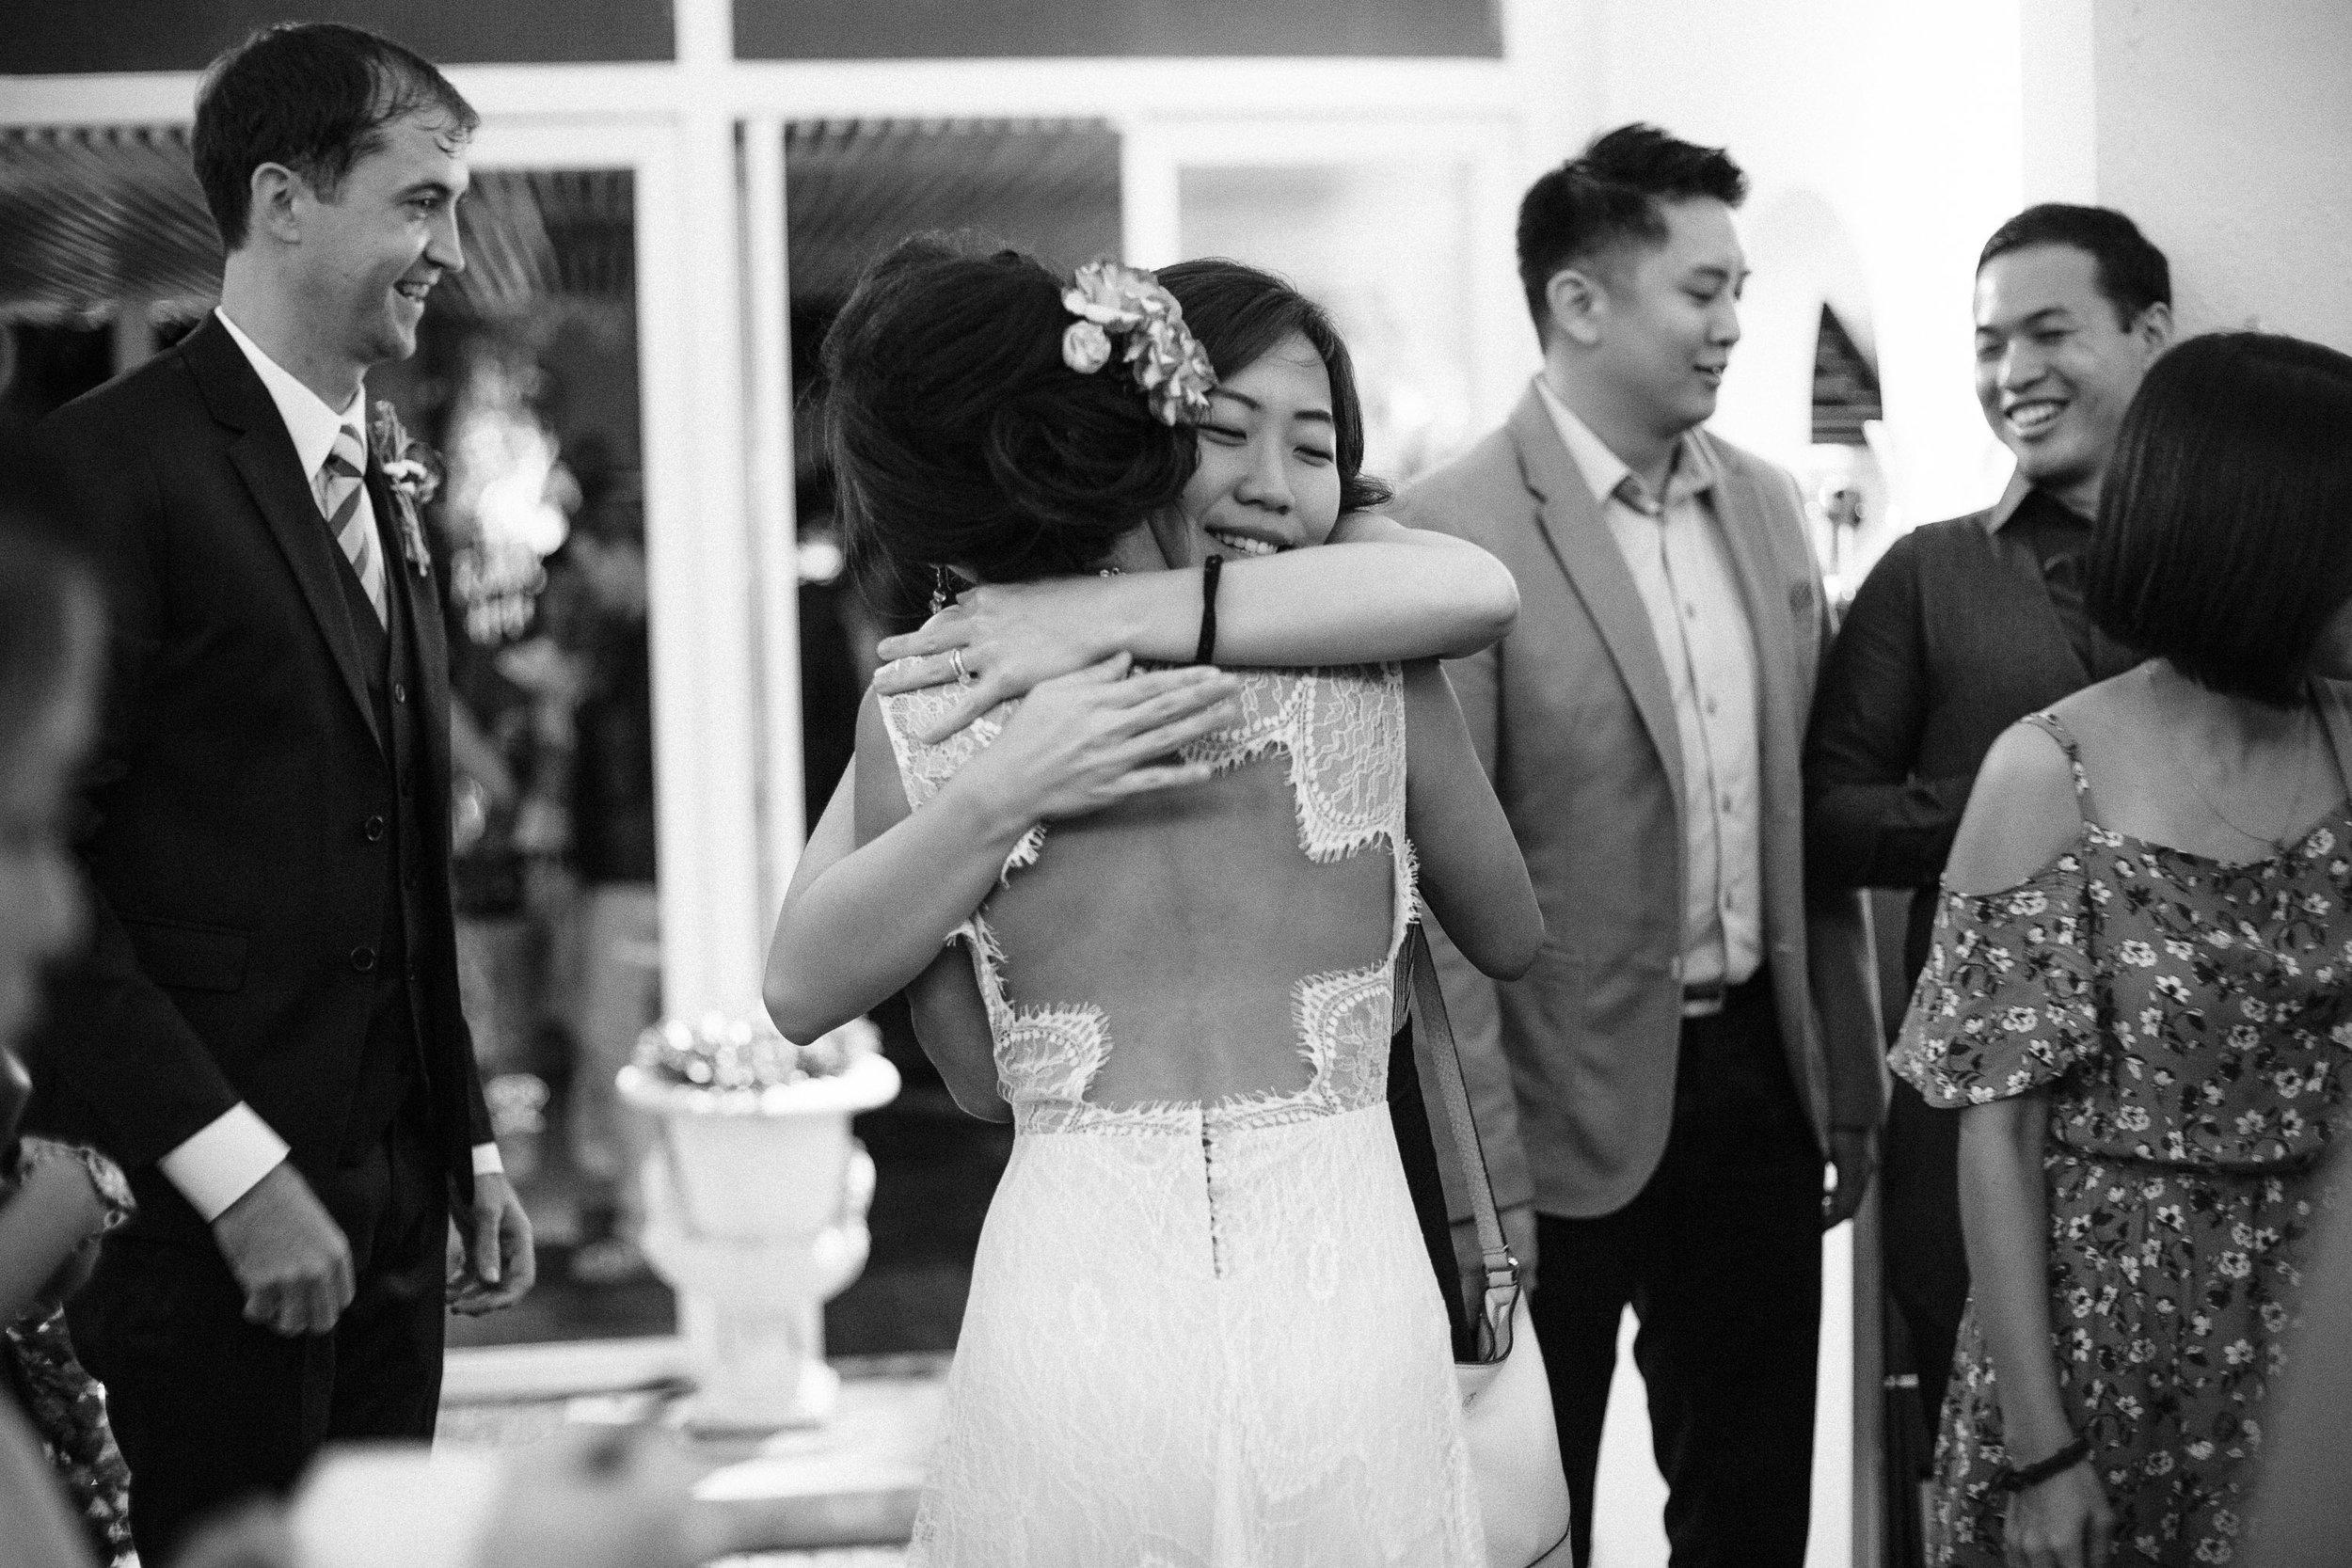 singapore-wedding-photographer-hiram-joyce-055.jpg